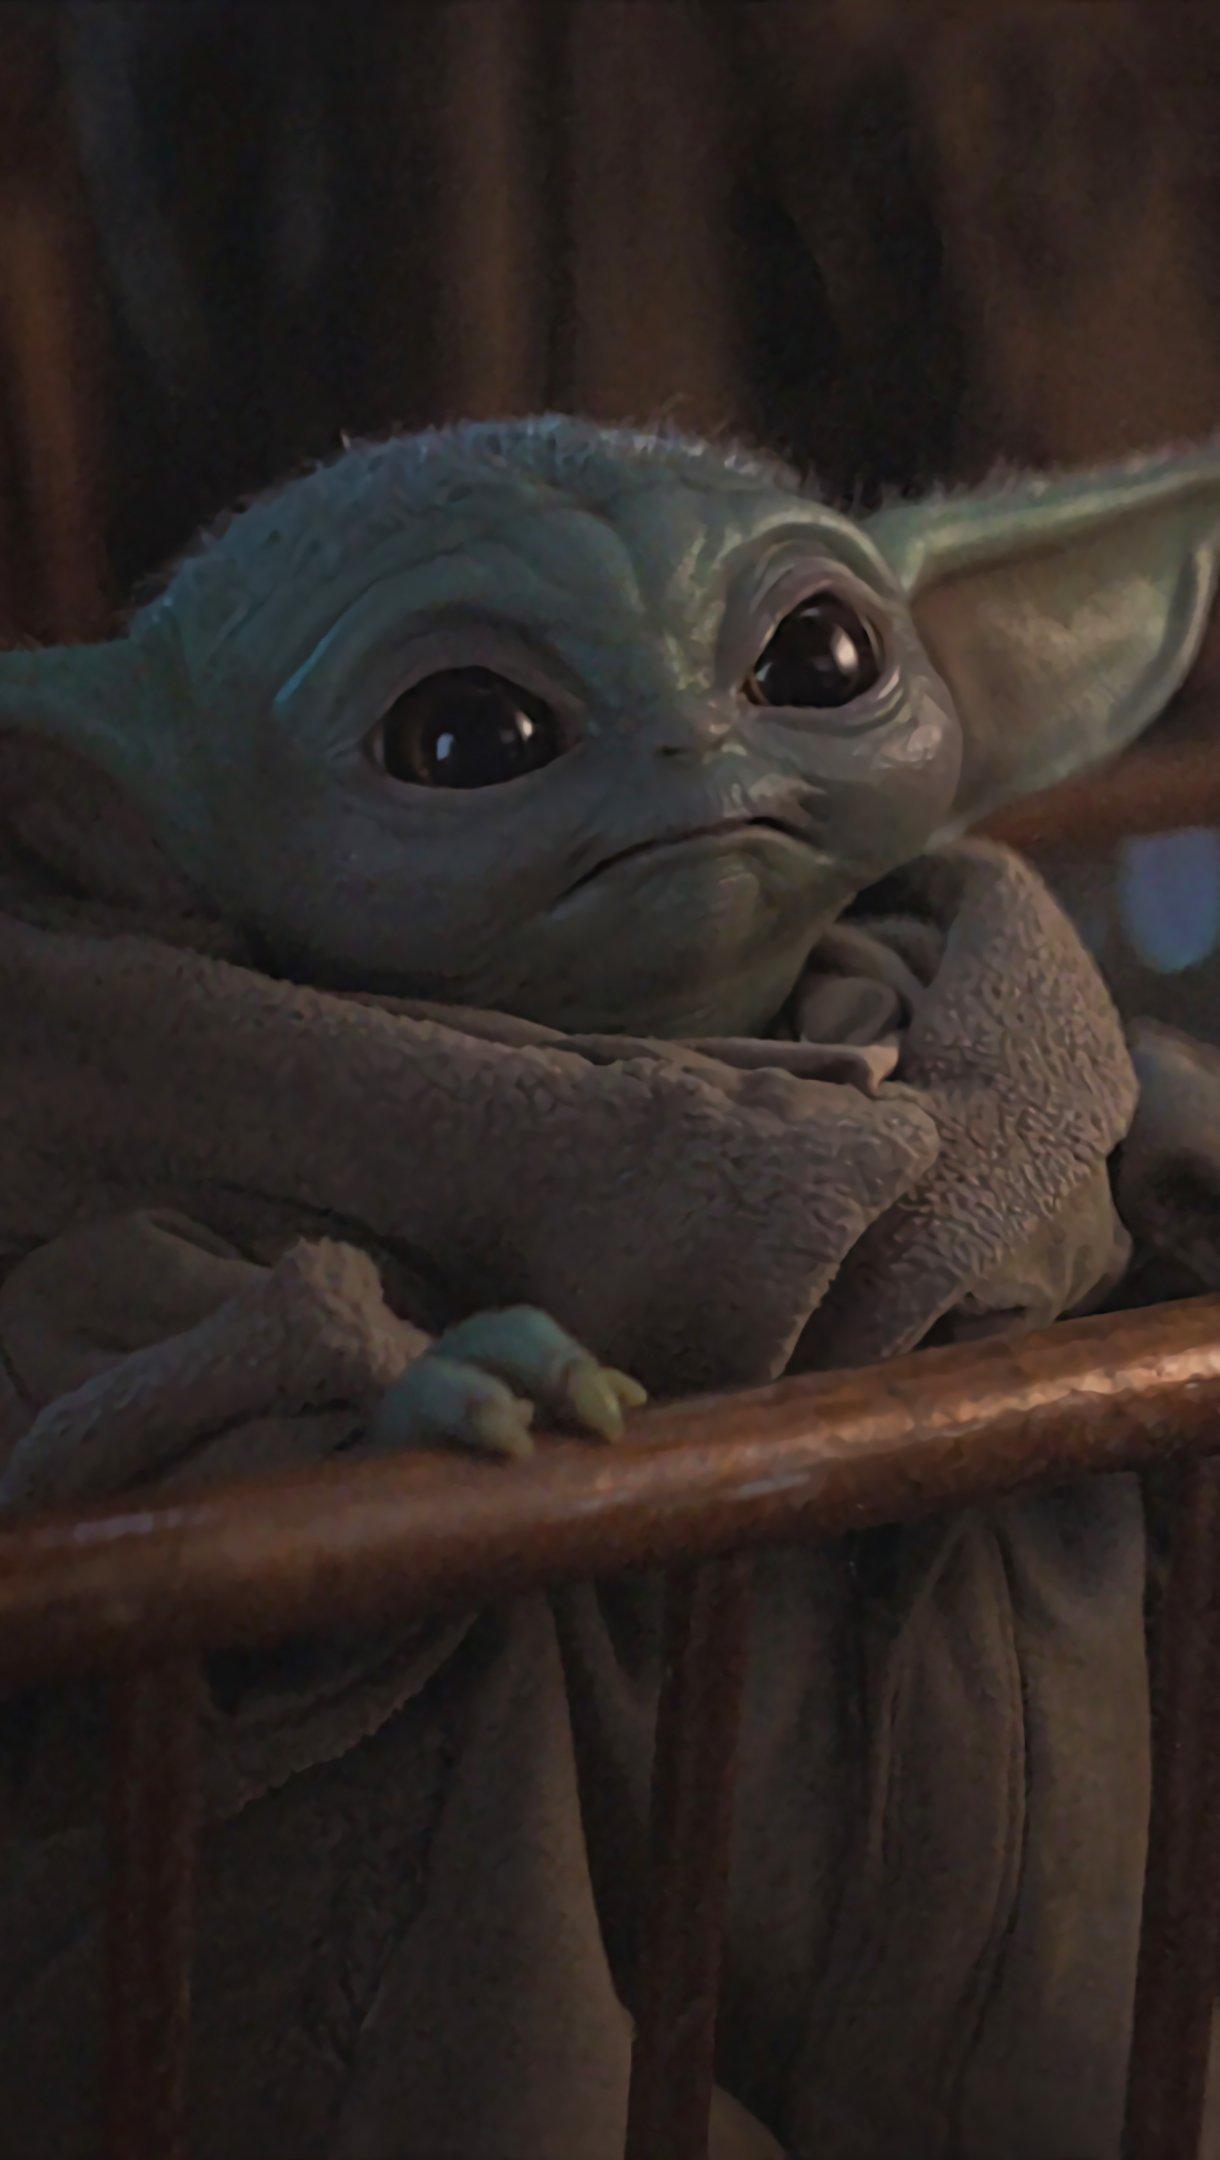 Baby Yoda From The Mandalorian Wallpaper 4k Ultra Hd Id 4405